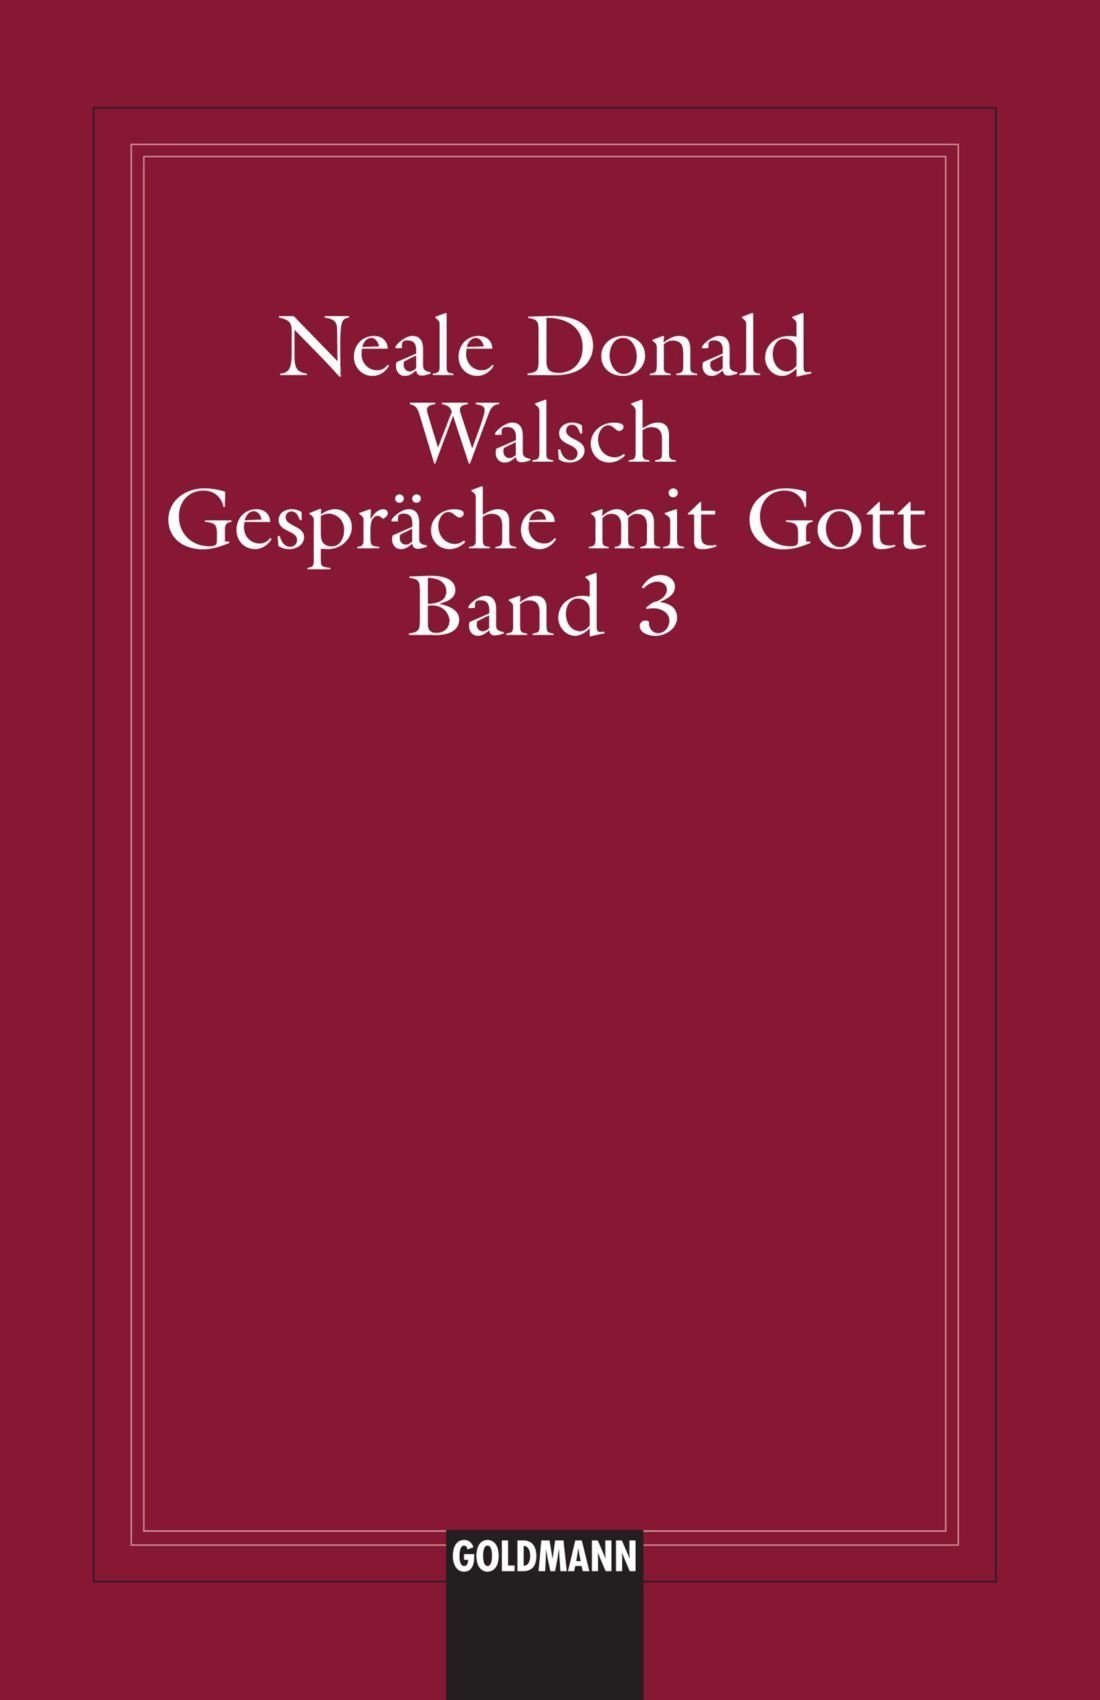 Arbeitsbuch Zu Band 3 (german Edition): Neale Donald Walsch: 9781400039128:  Amazon: Books